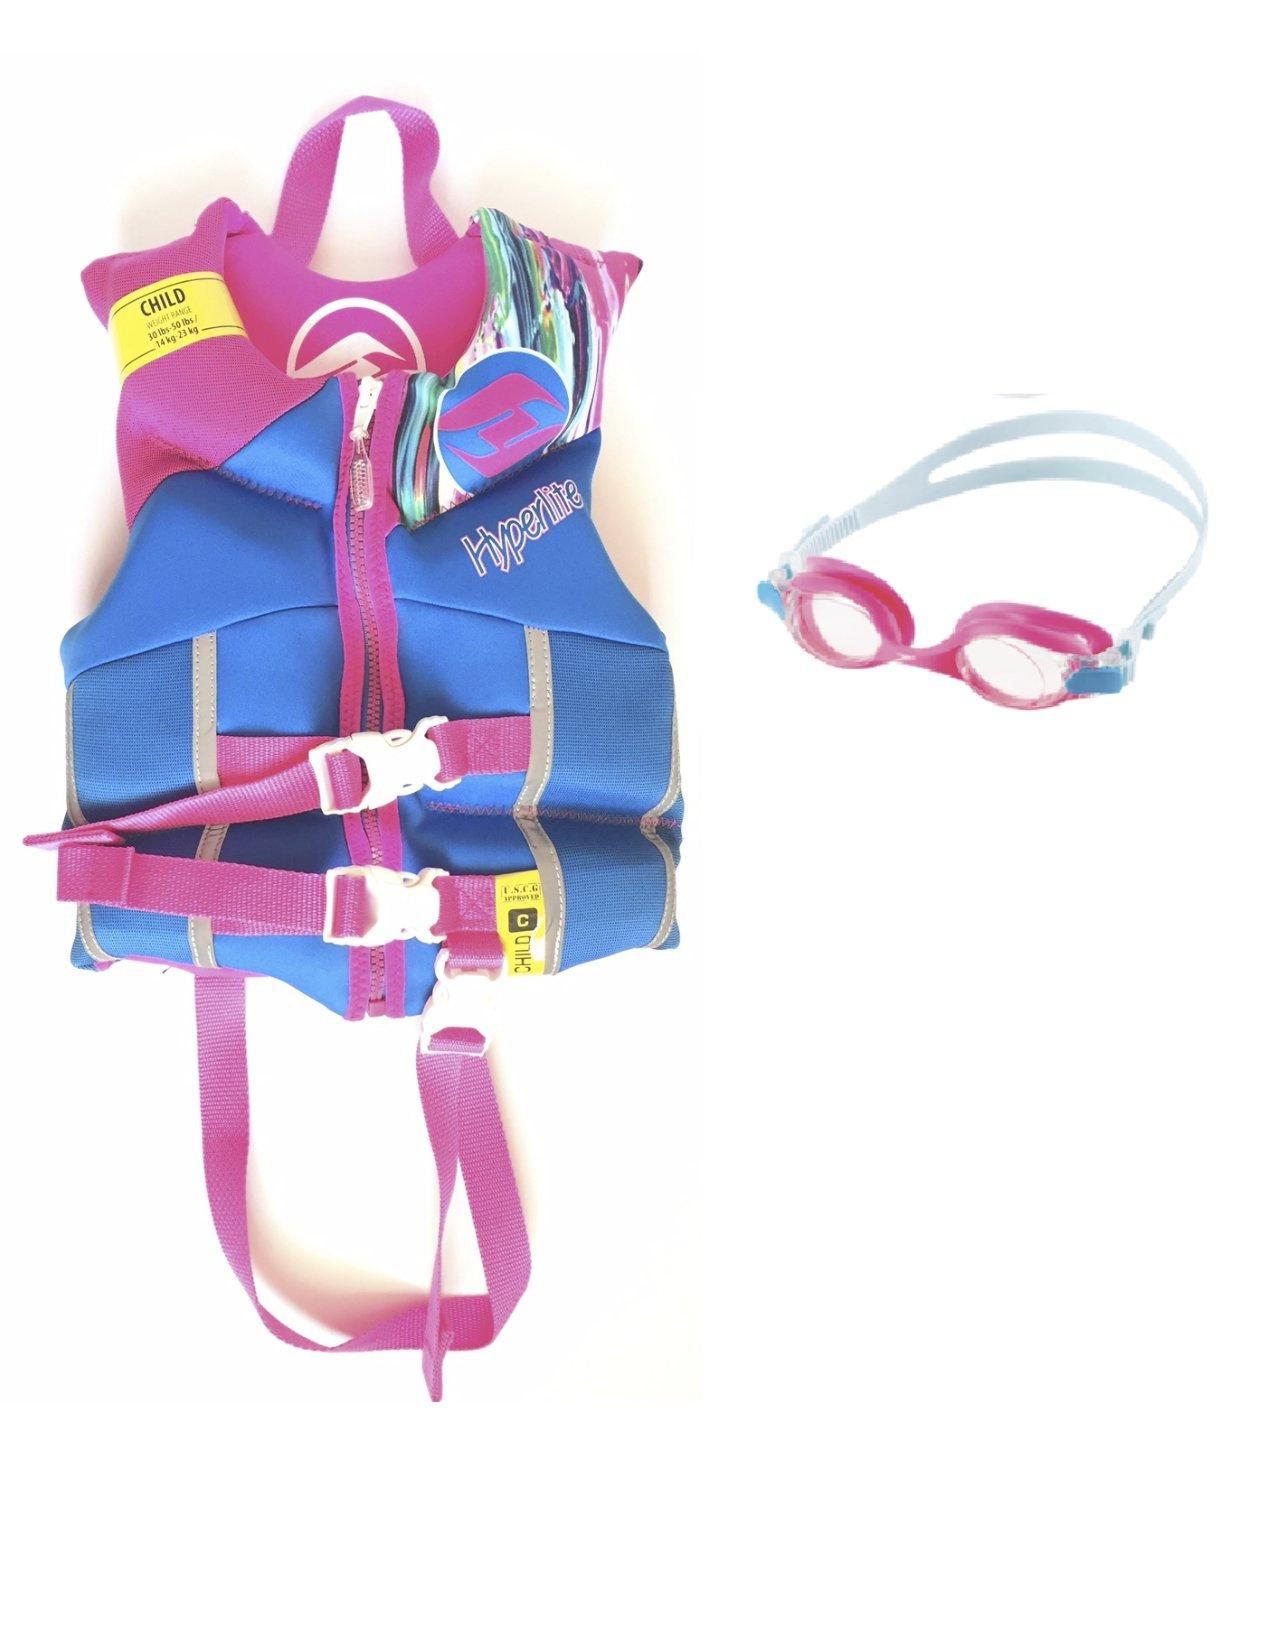 2016 Hyperlite Girls Girlz Kids Pink Blue Child Life Vest Jacket Wakeboarding Fishing Boating Swimming- 30-45lbs + Bonus Speedo Goggles